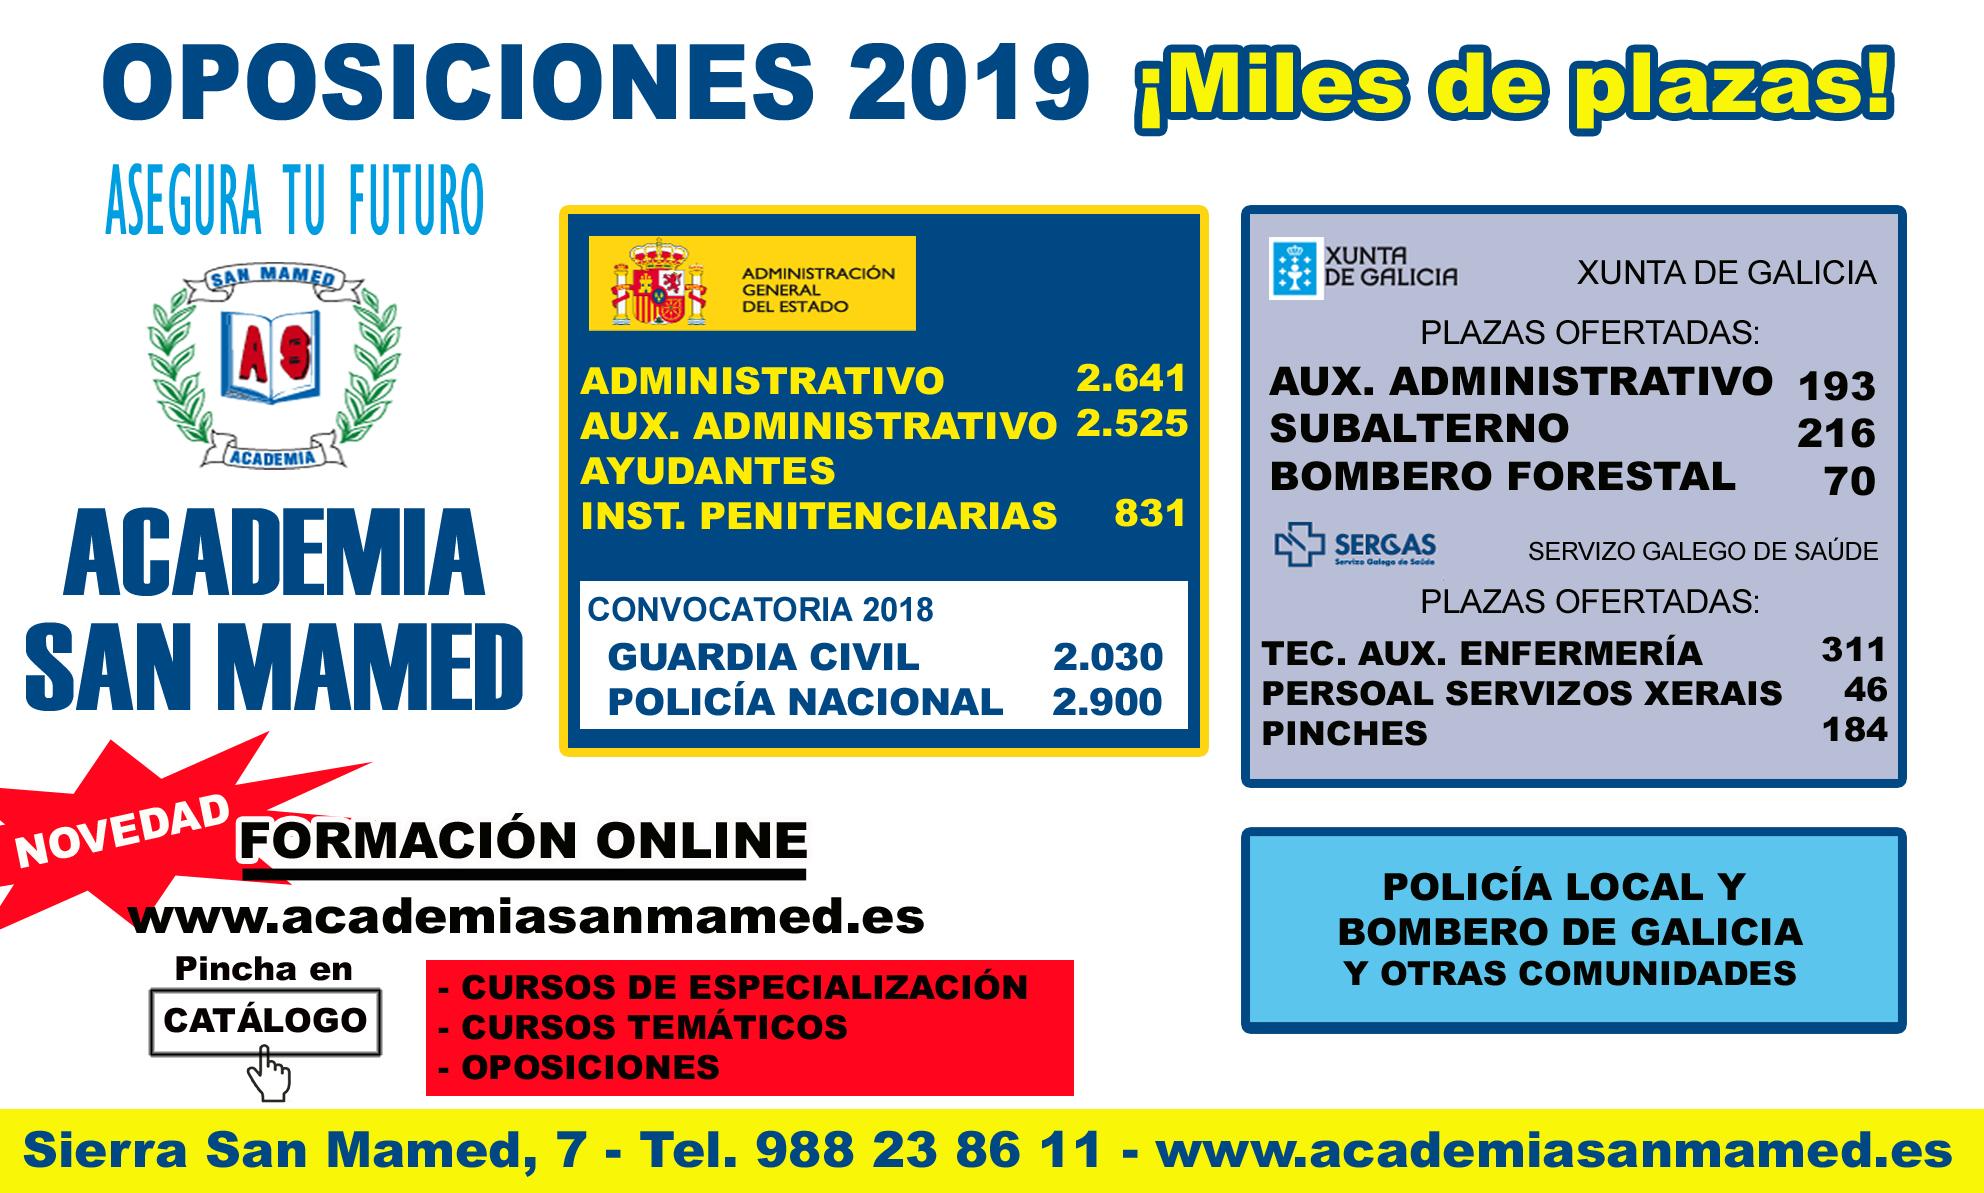 4X3 academia san mamed enero19 copia